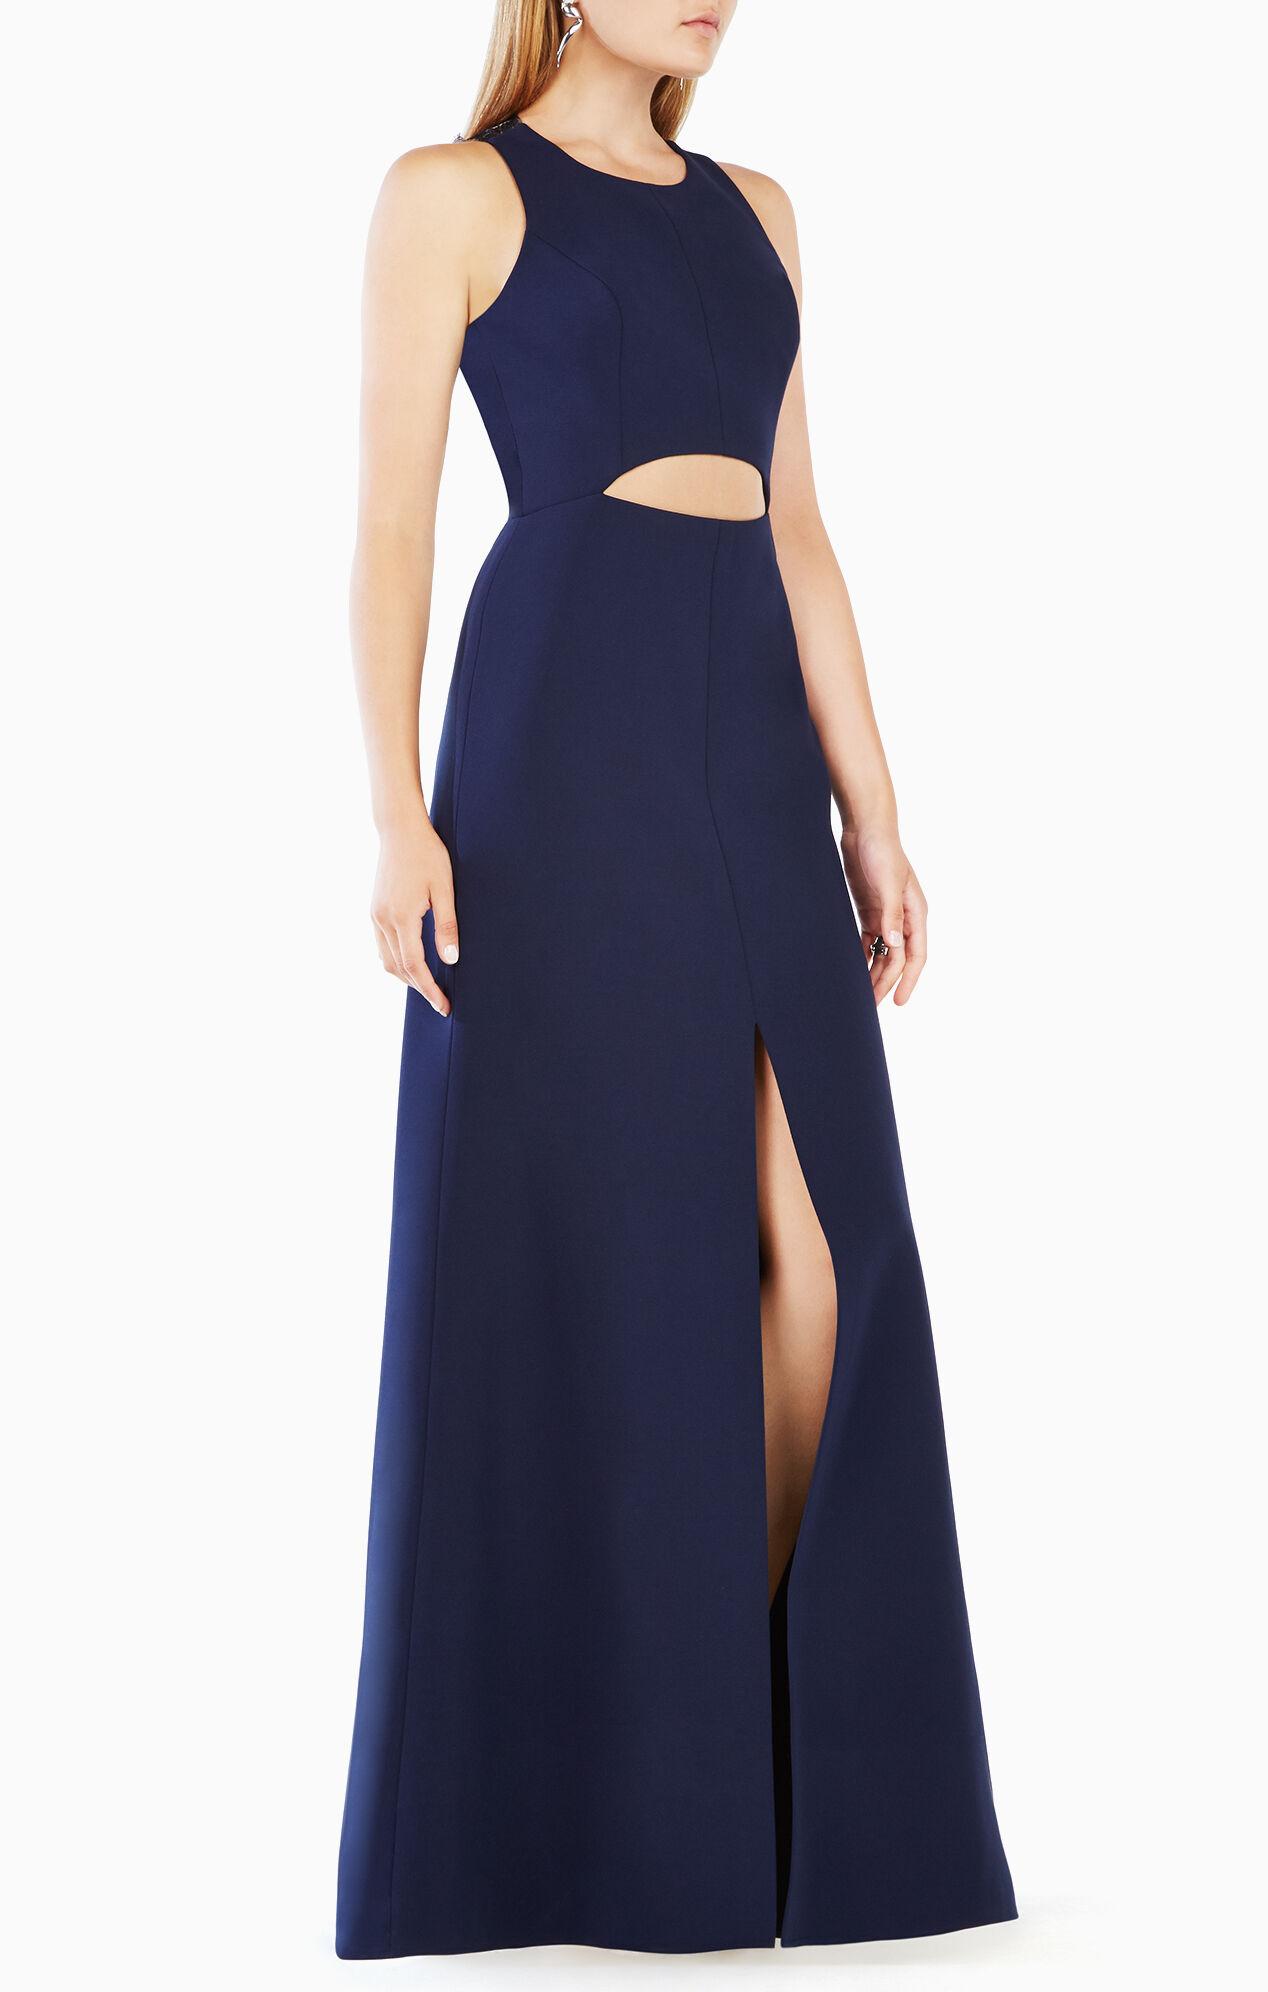 Veranna Lace-Back Gown